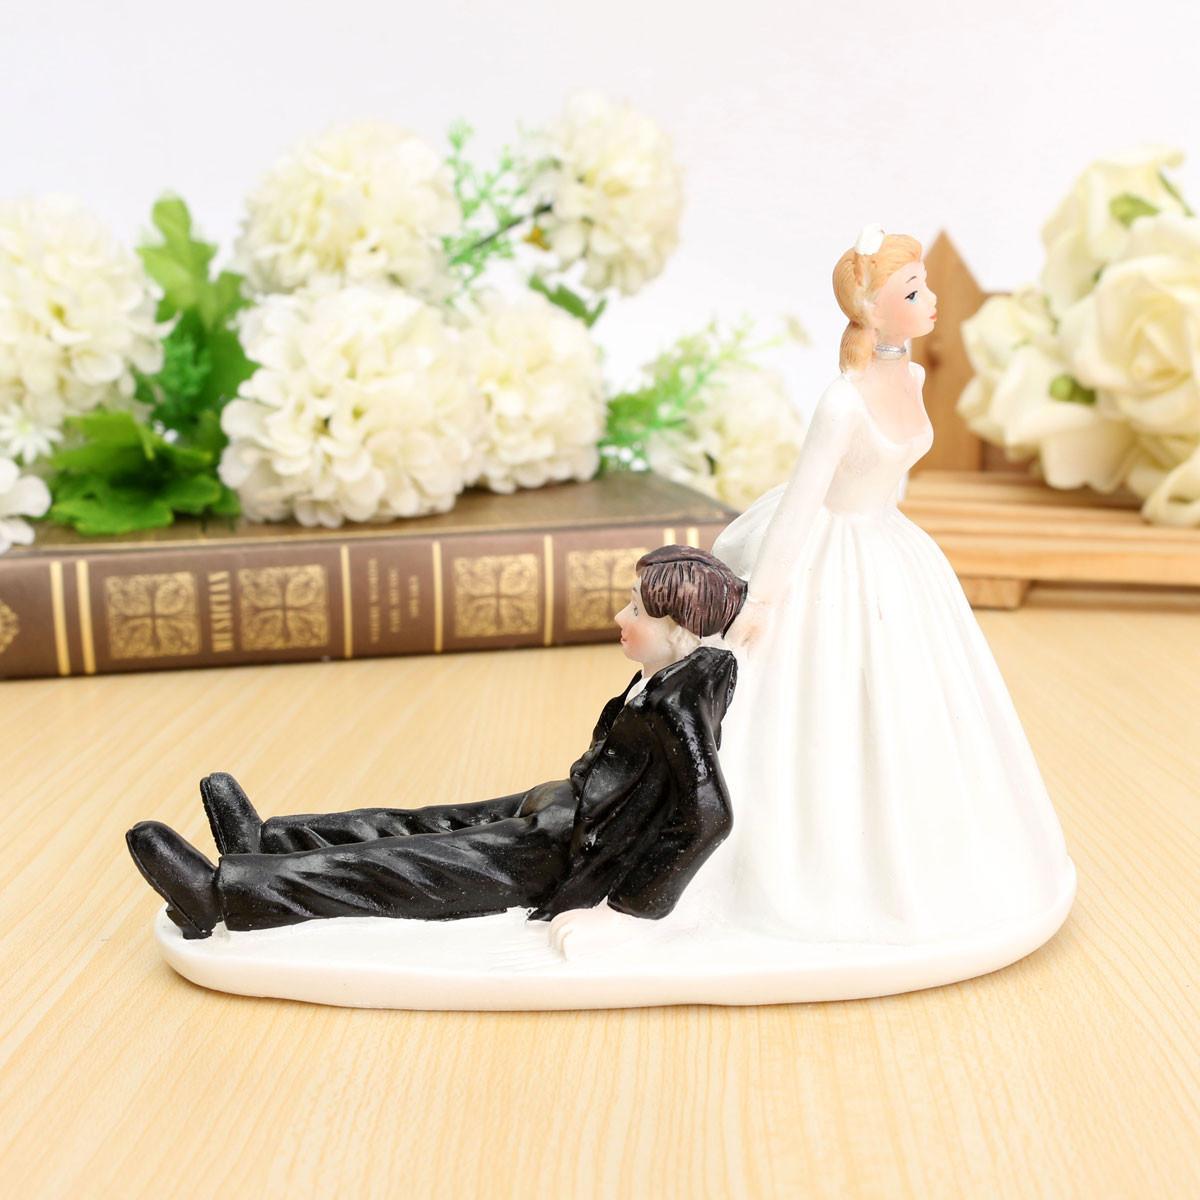 Wedding Cakes Figures  ROMANTIC FUNNY WEDDING CAKE TOPPER FIGURE BRIDE GROOM